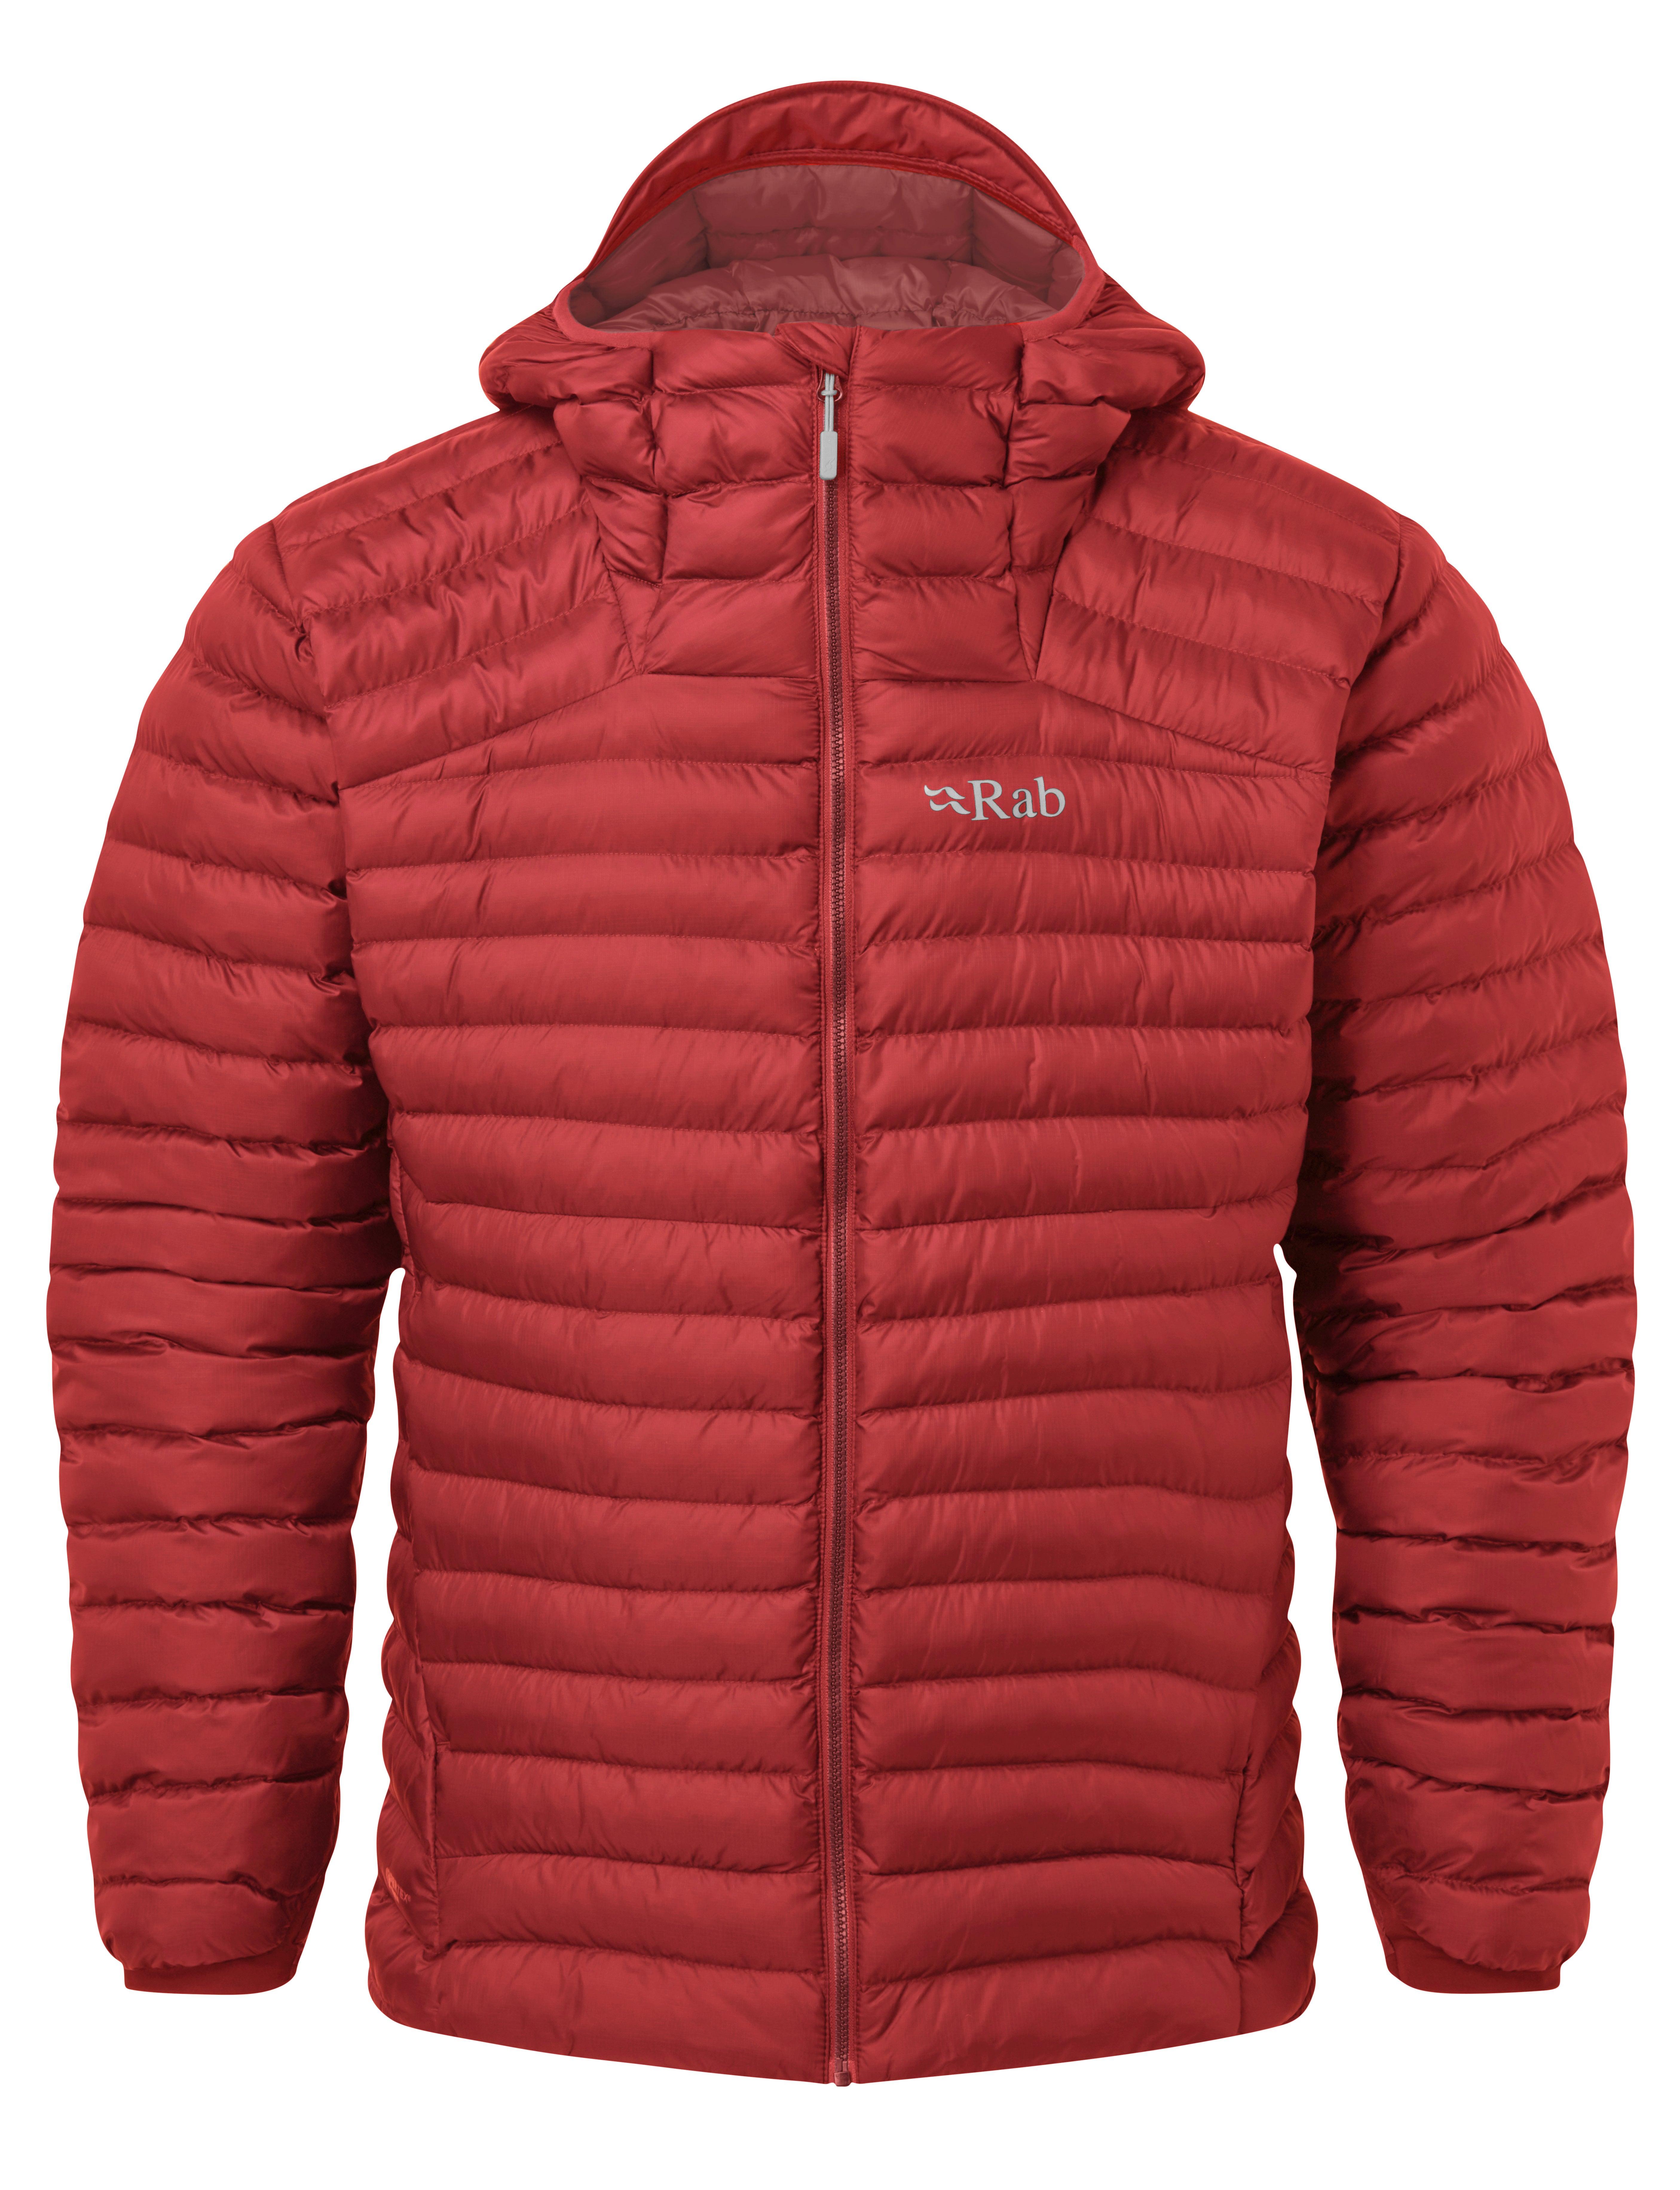 Rab Cirrus Alpine Men's Midlayer Jacket